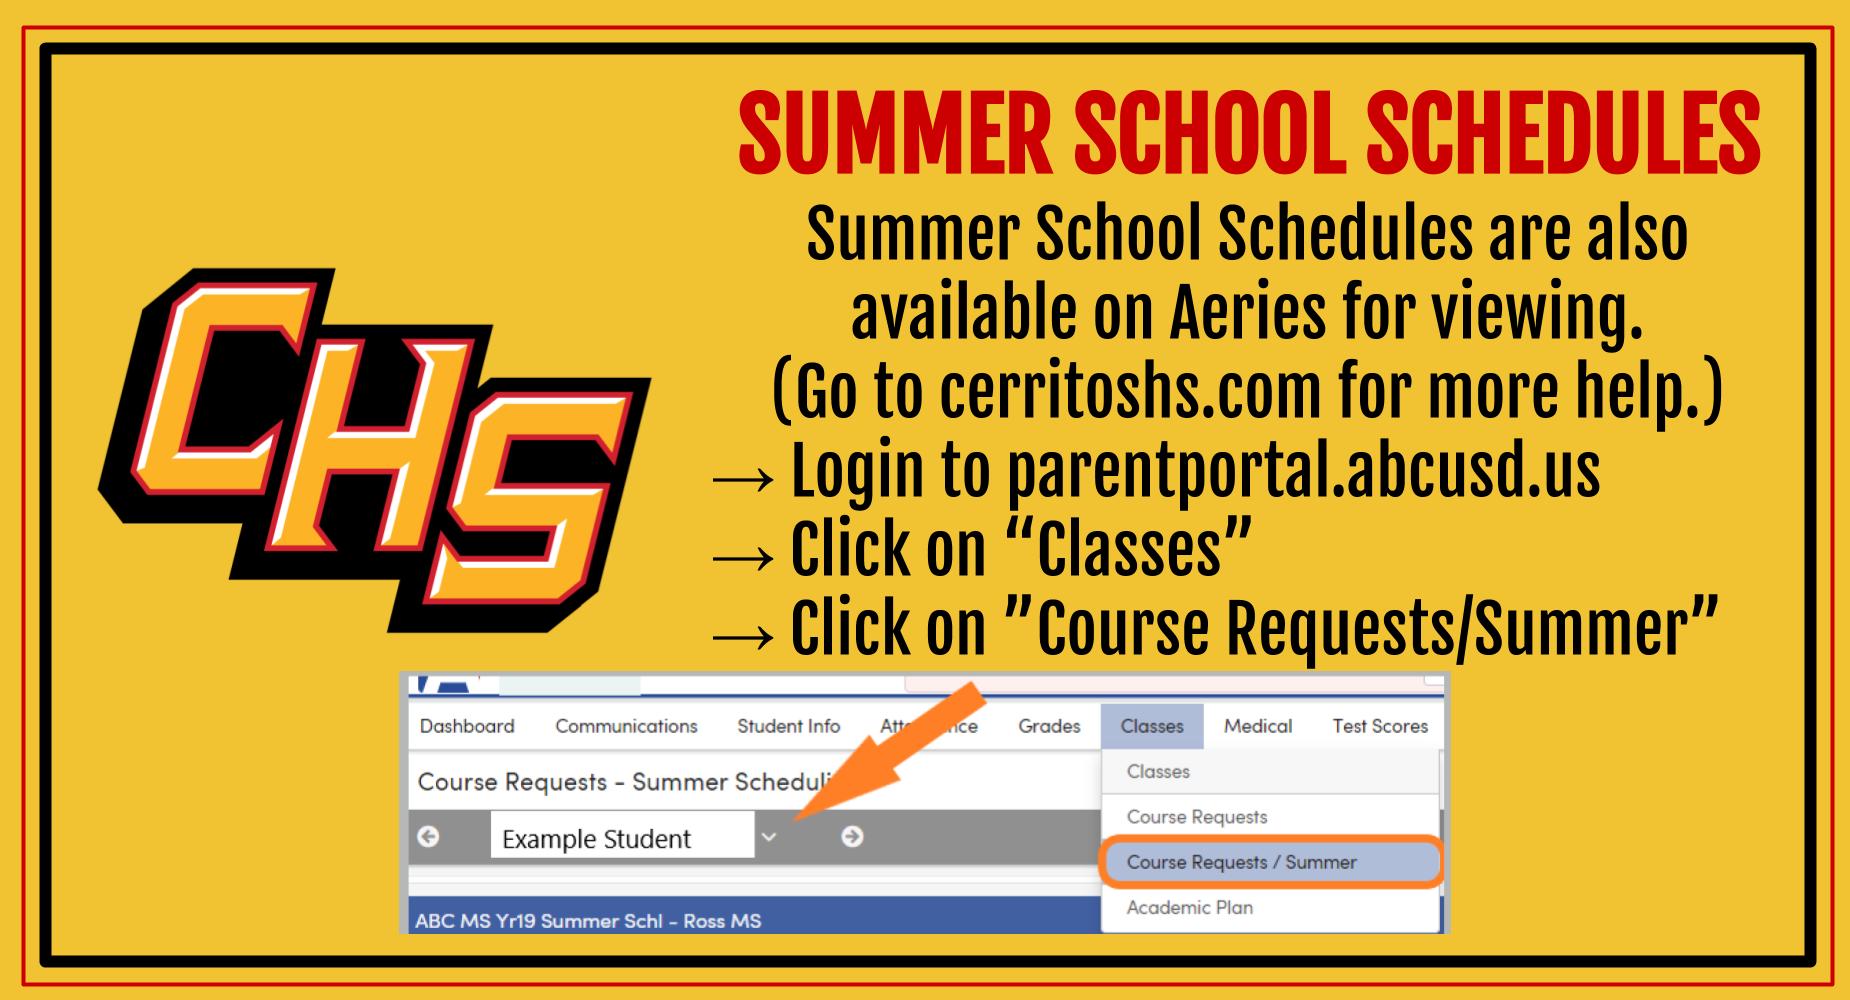 Summer School Schedules Online Now